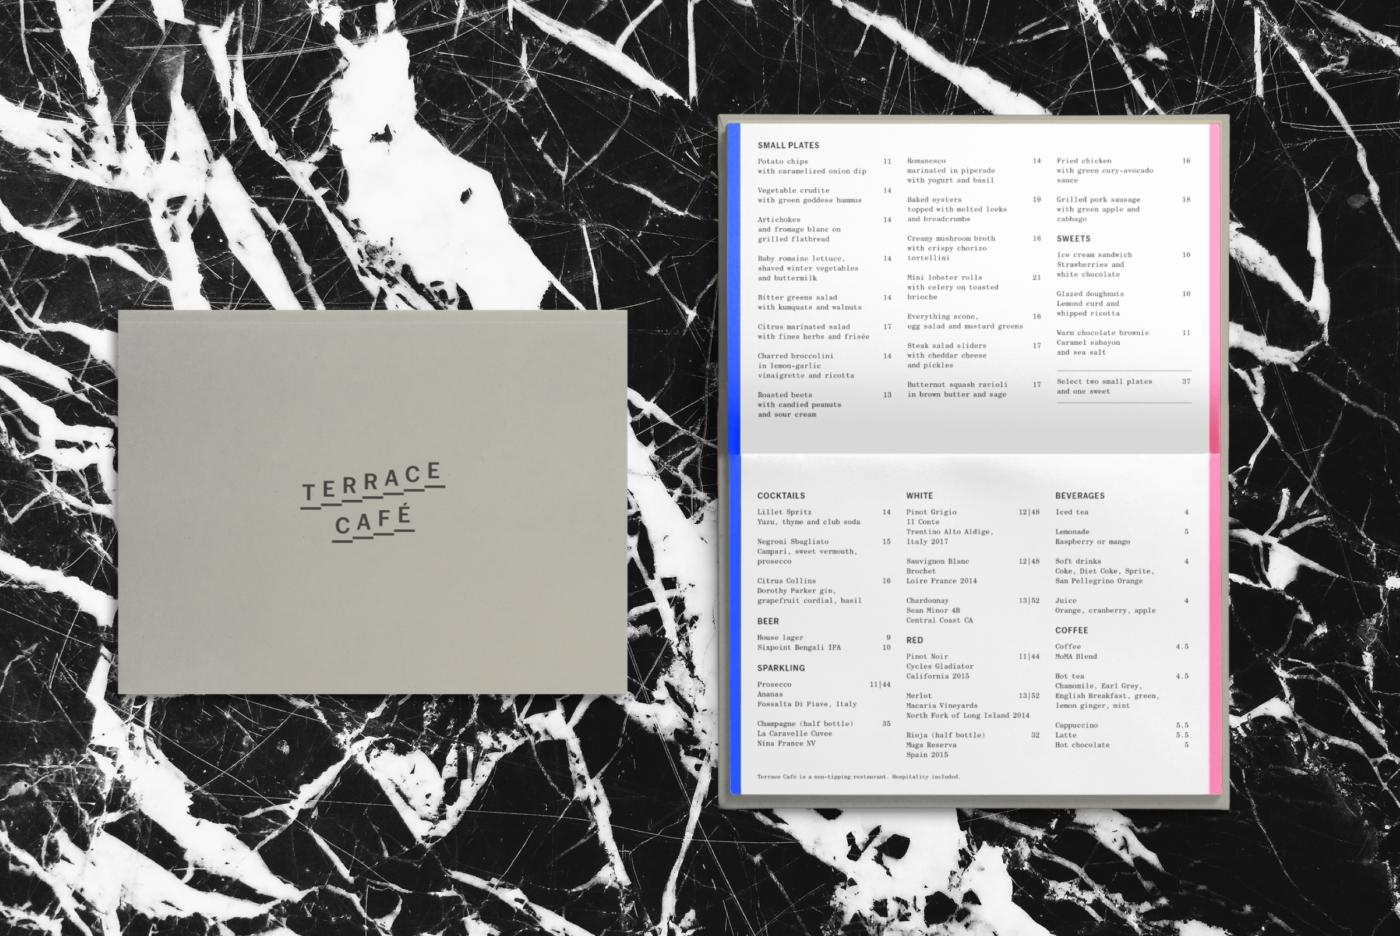 Llwebsite Terracecafe5 6